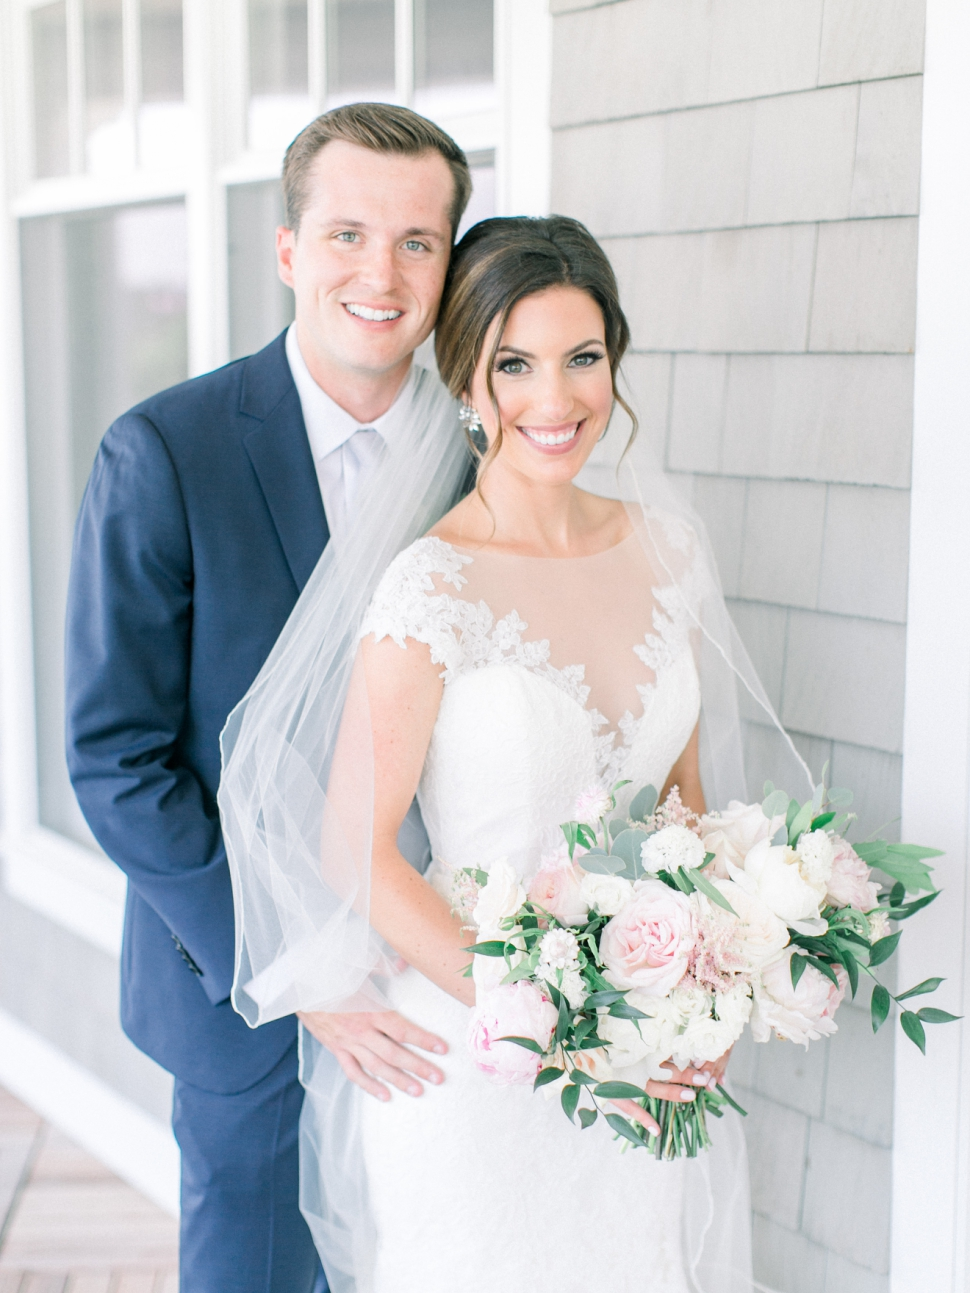 Connecticut-Wedding-Photographer-Cassi-Claire-Shorehaven-Golf-Club-Wedding_15.jpg